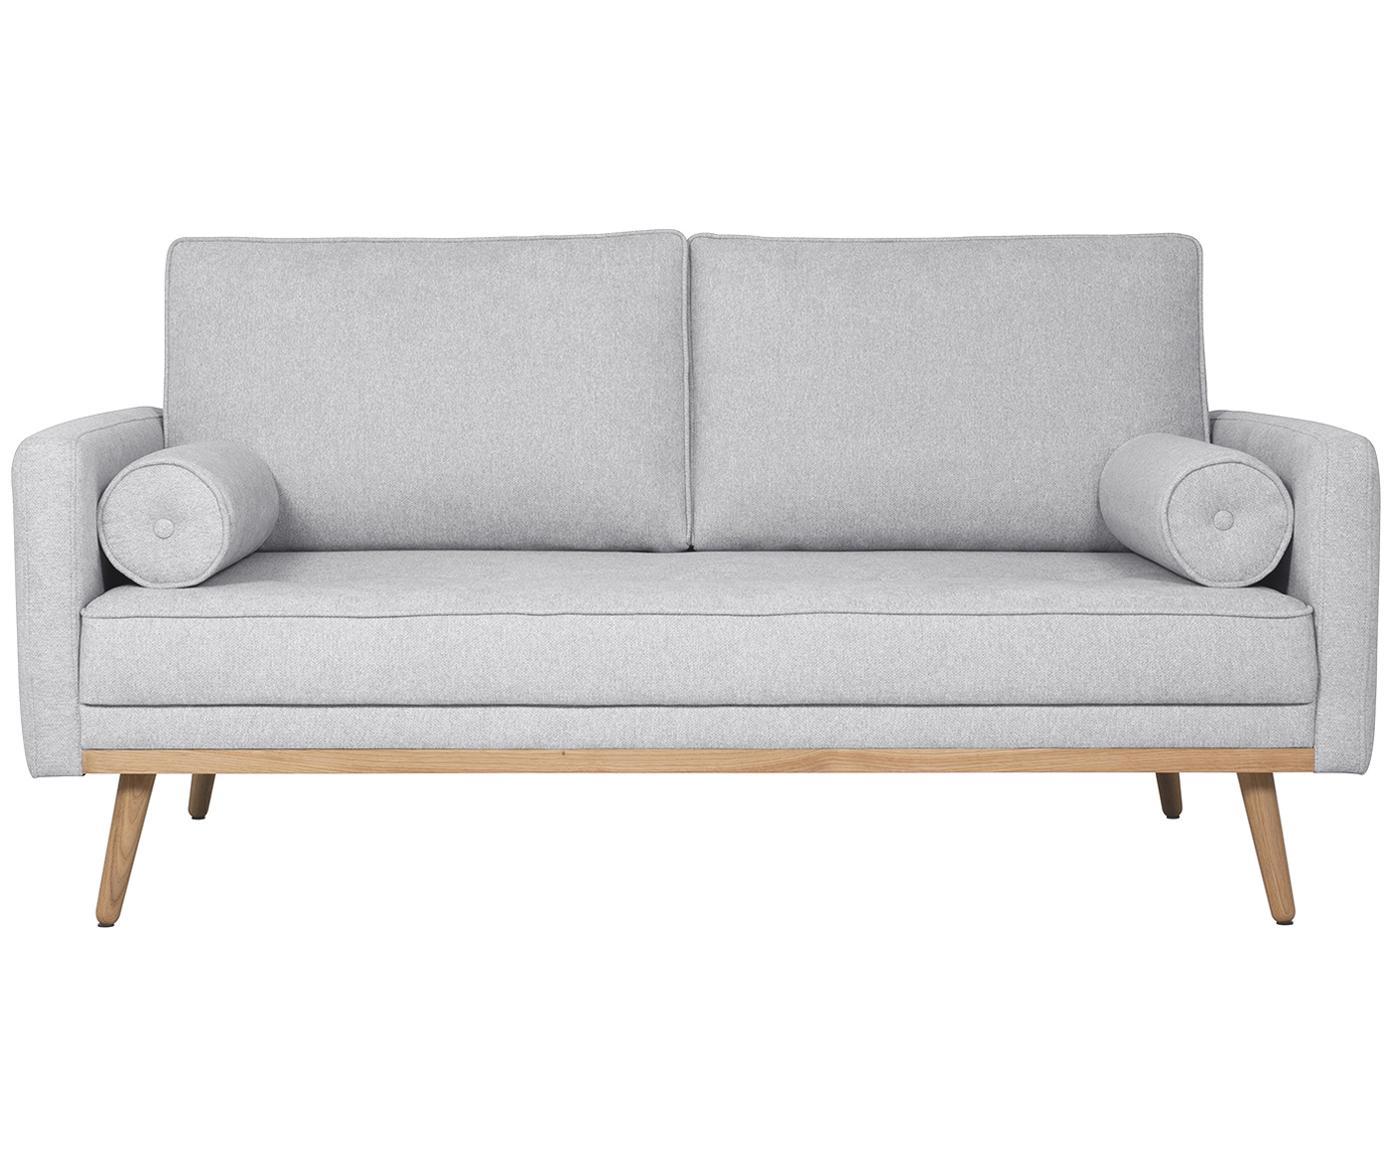 Sofa Saint (2-Sitzer), Bezug: Polyester 50.000 Scheuert, Gestell: Massives Kiefernholz, Spa, Webstoff Hellgrau, B 169 x T 93 cm